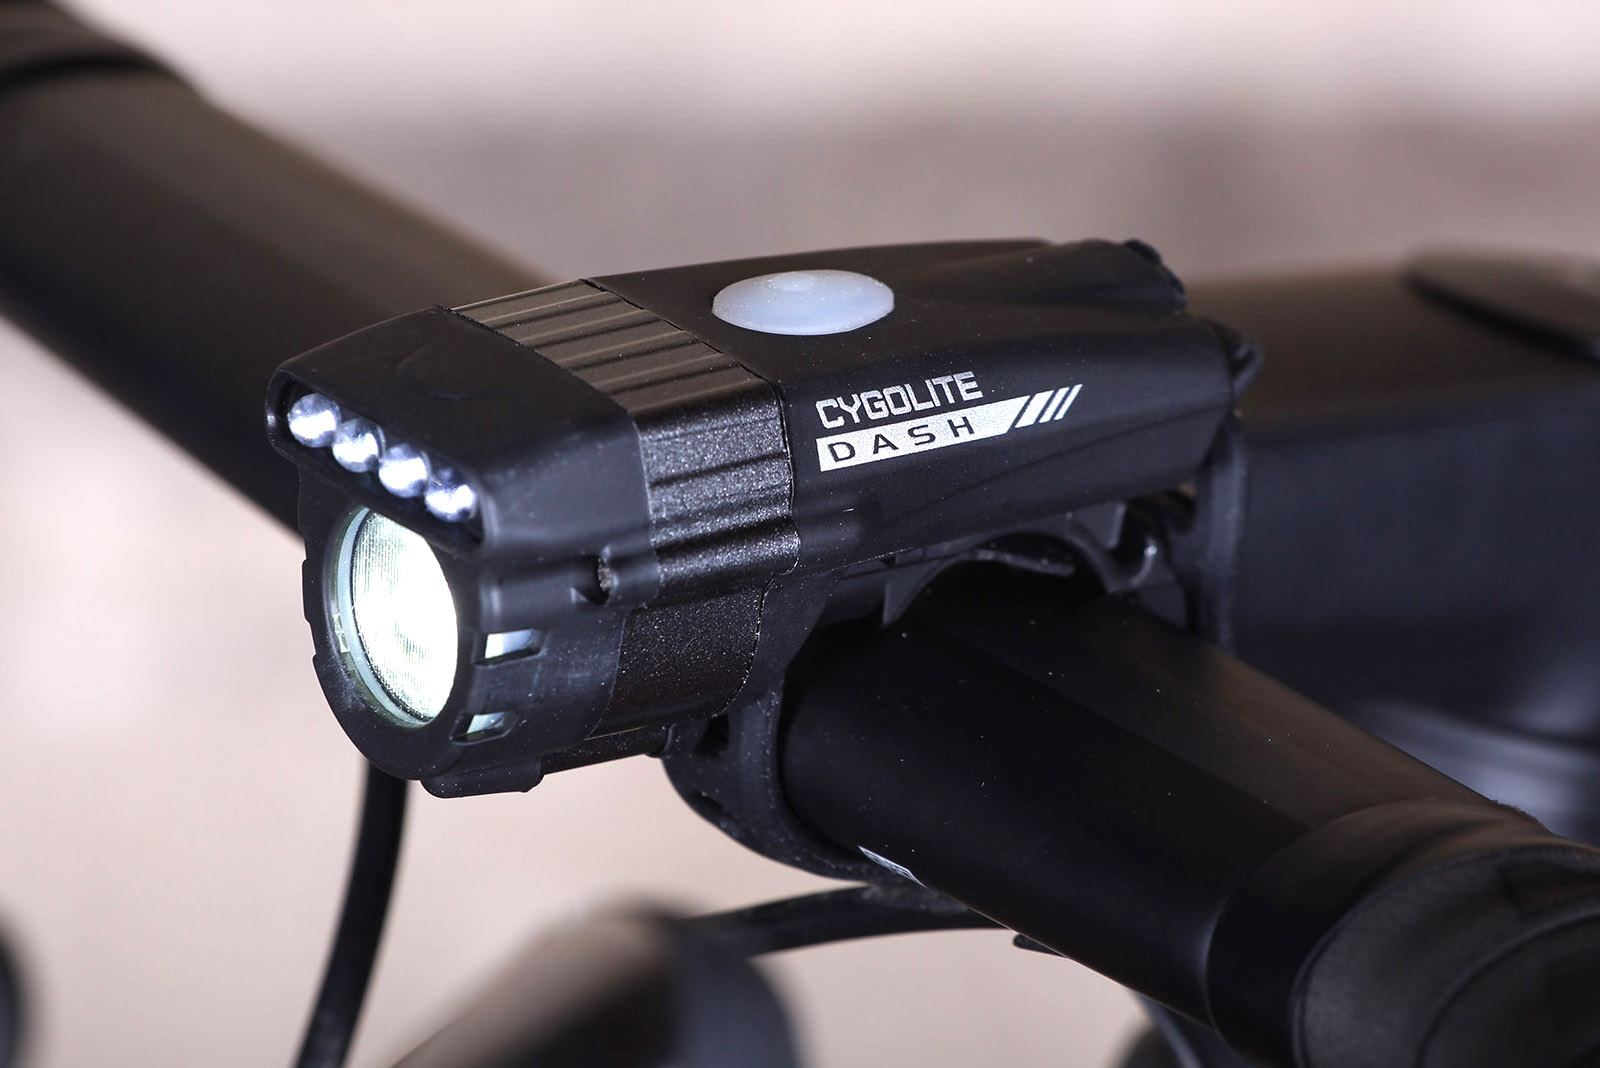 Cygolite Zot 450 Lumen Headlight Bike Light USB Rechargeable Easy Mount Bright